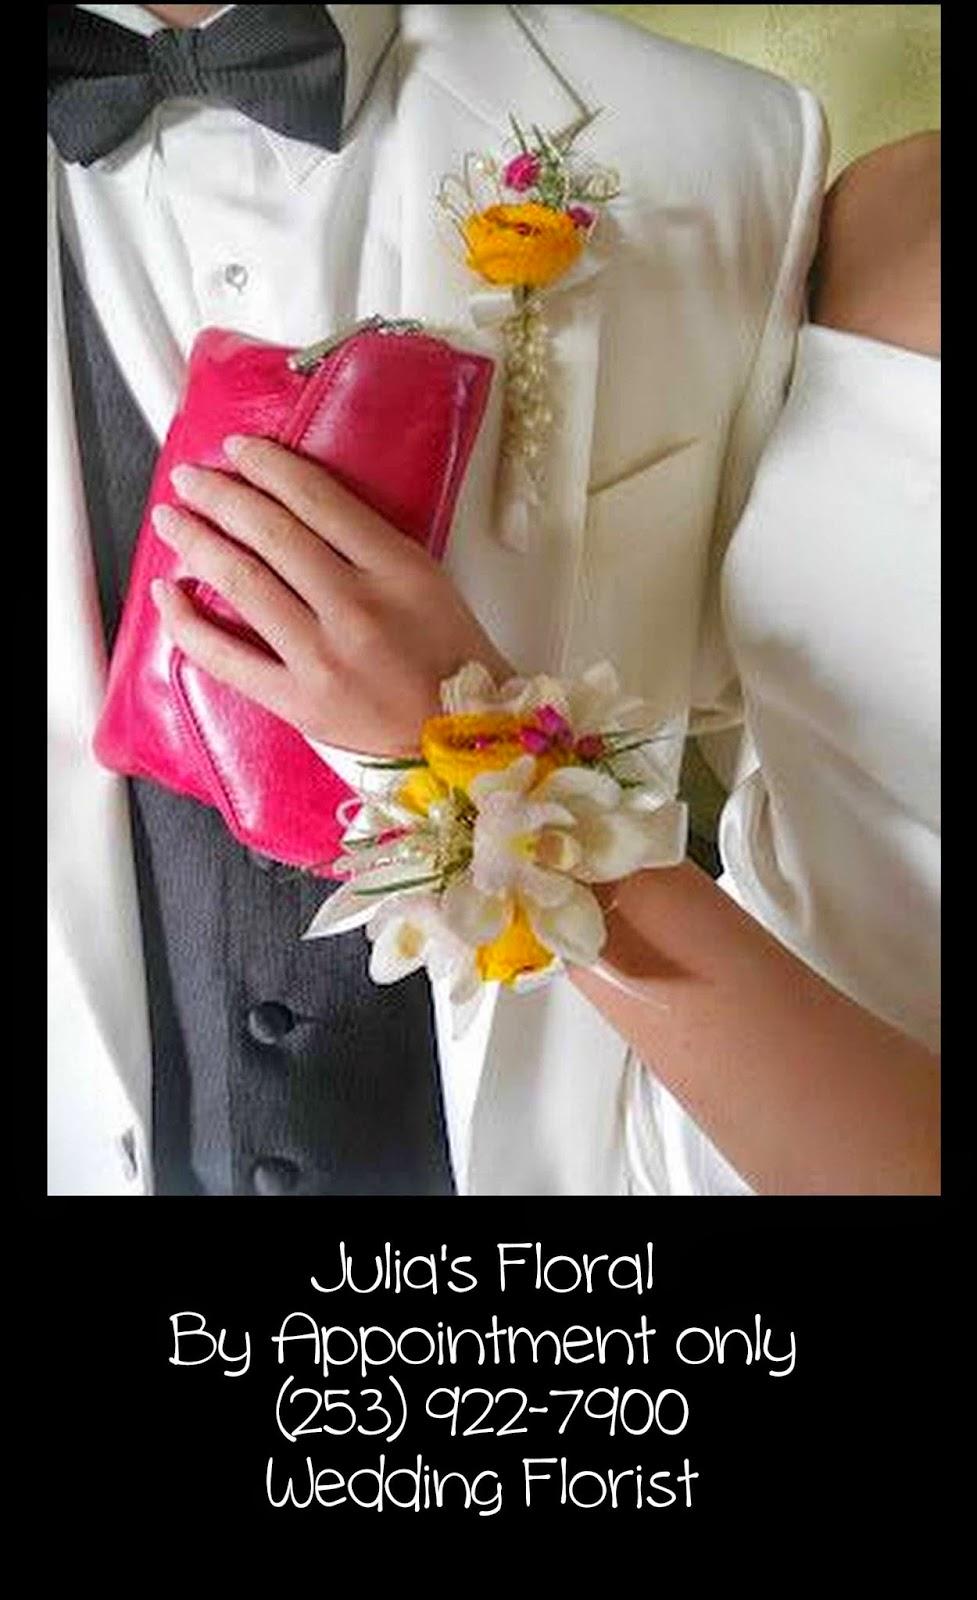 http://juliasfloral.com/